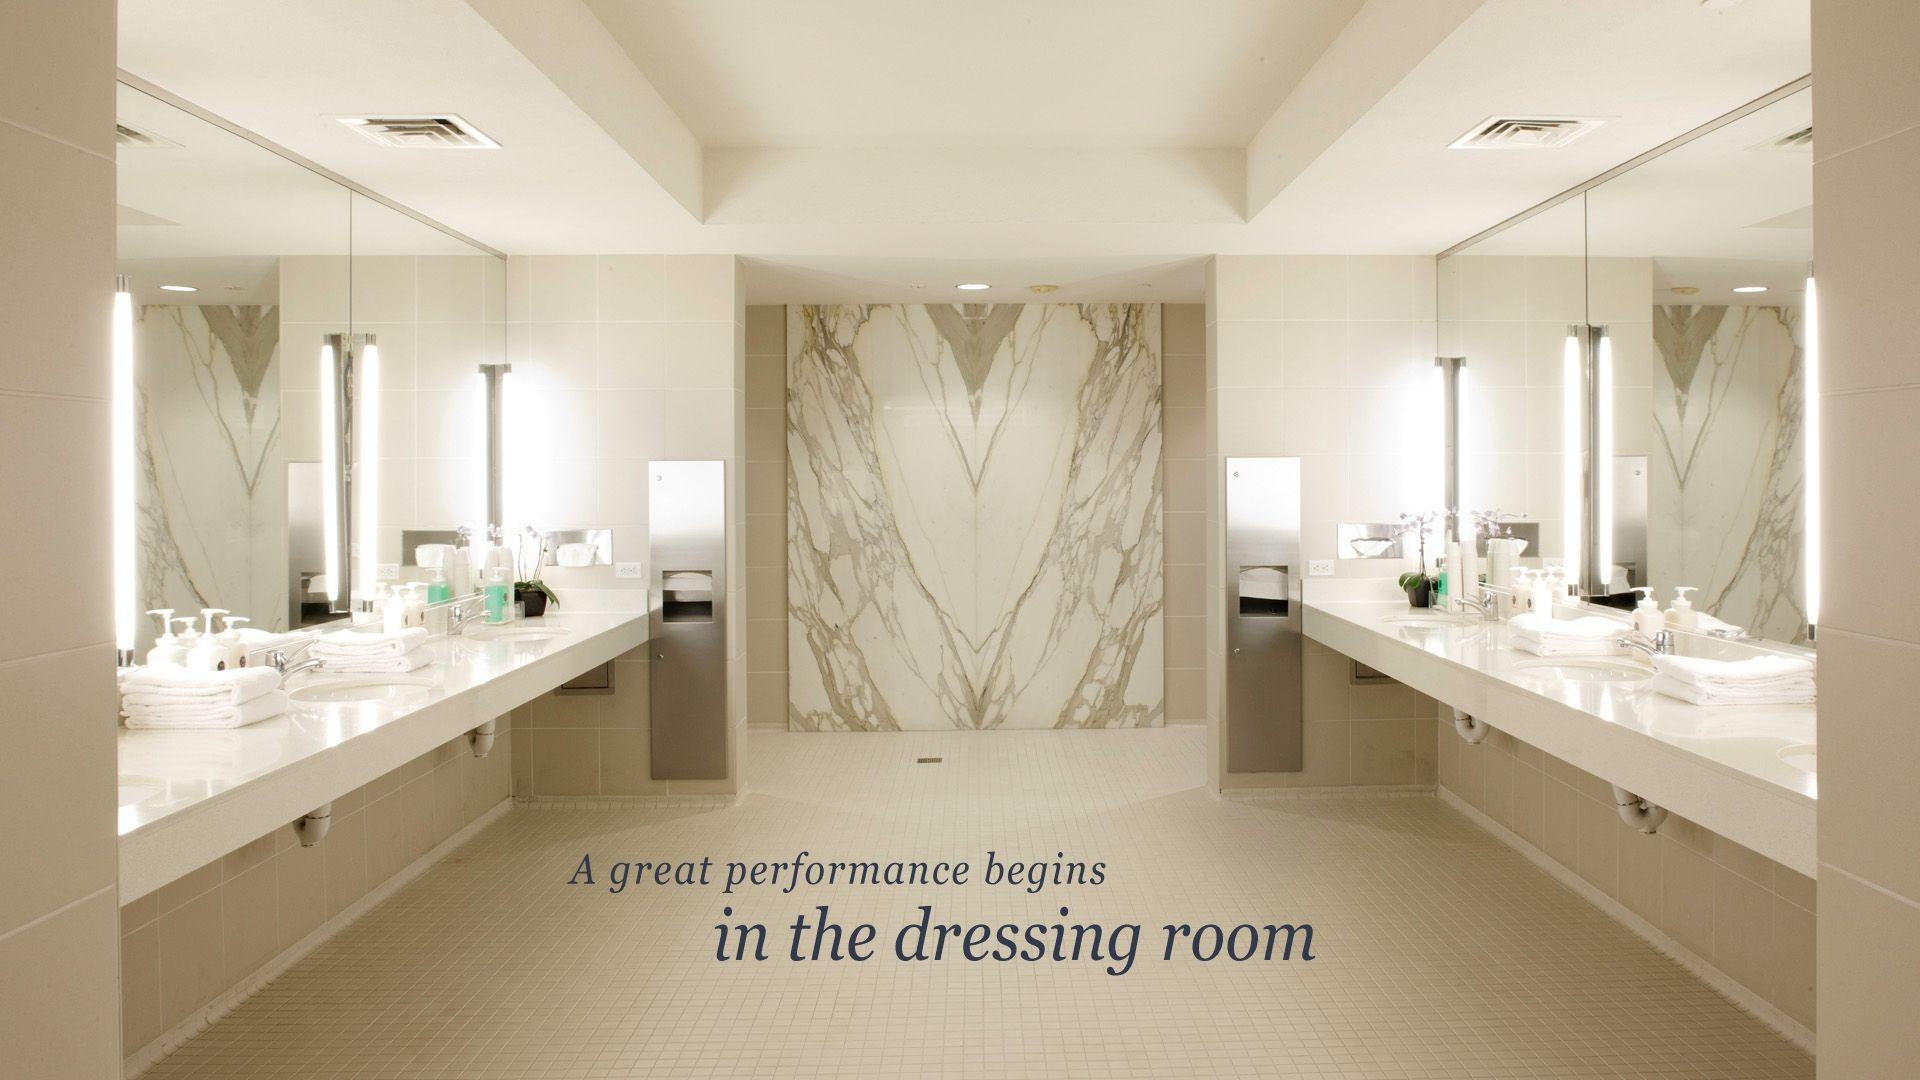 Bay Club San Francisco - Women's Locker Room, Vanity Area. Pinned ...